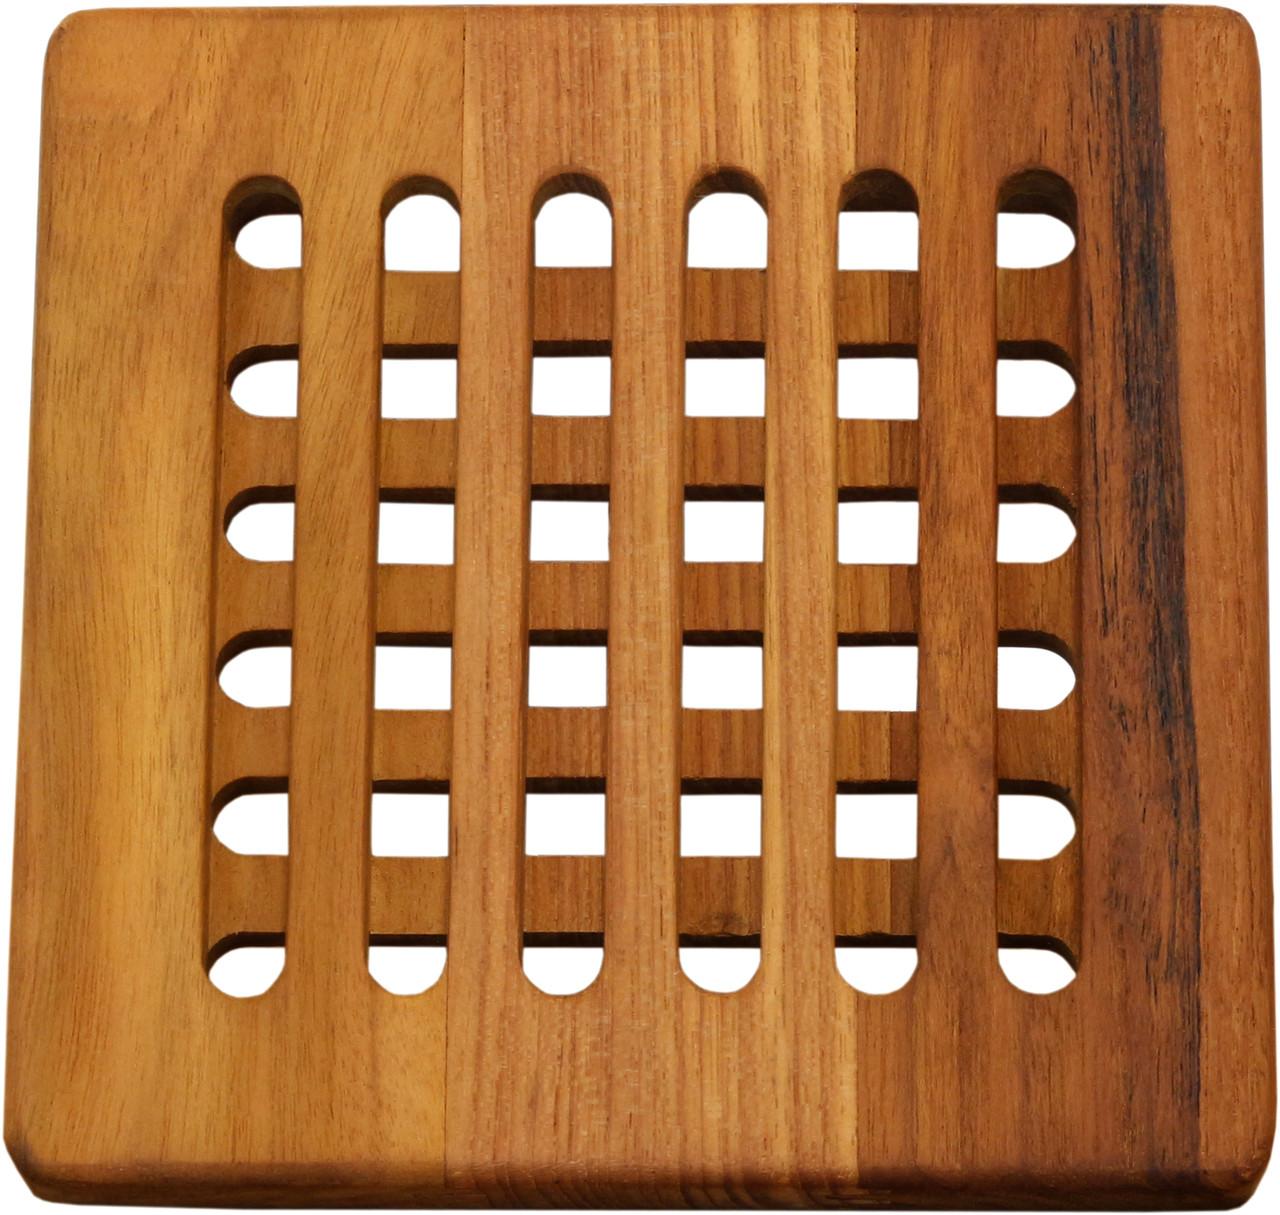 Teak Wood Trivet Protect Your Kitchen Surfaces With Elegance Aquateak